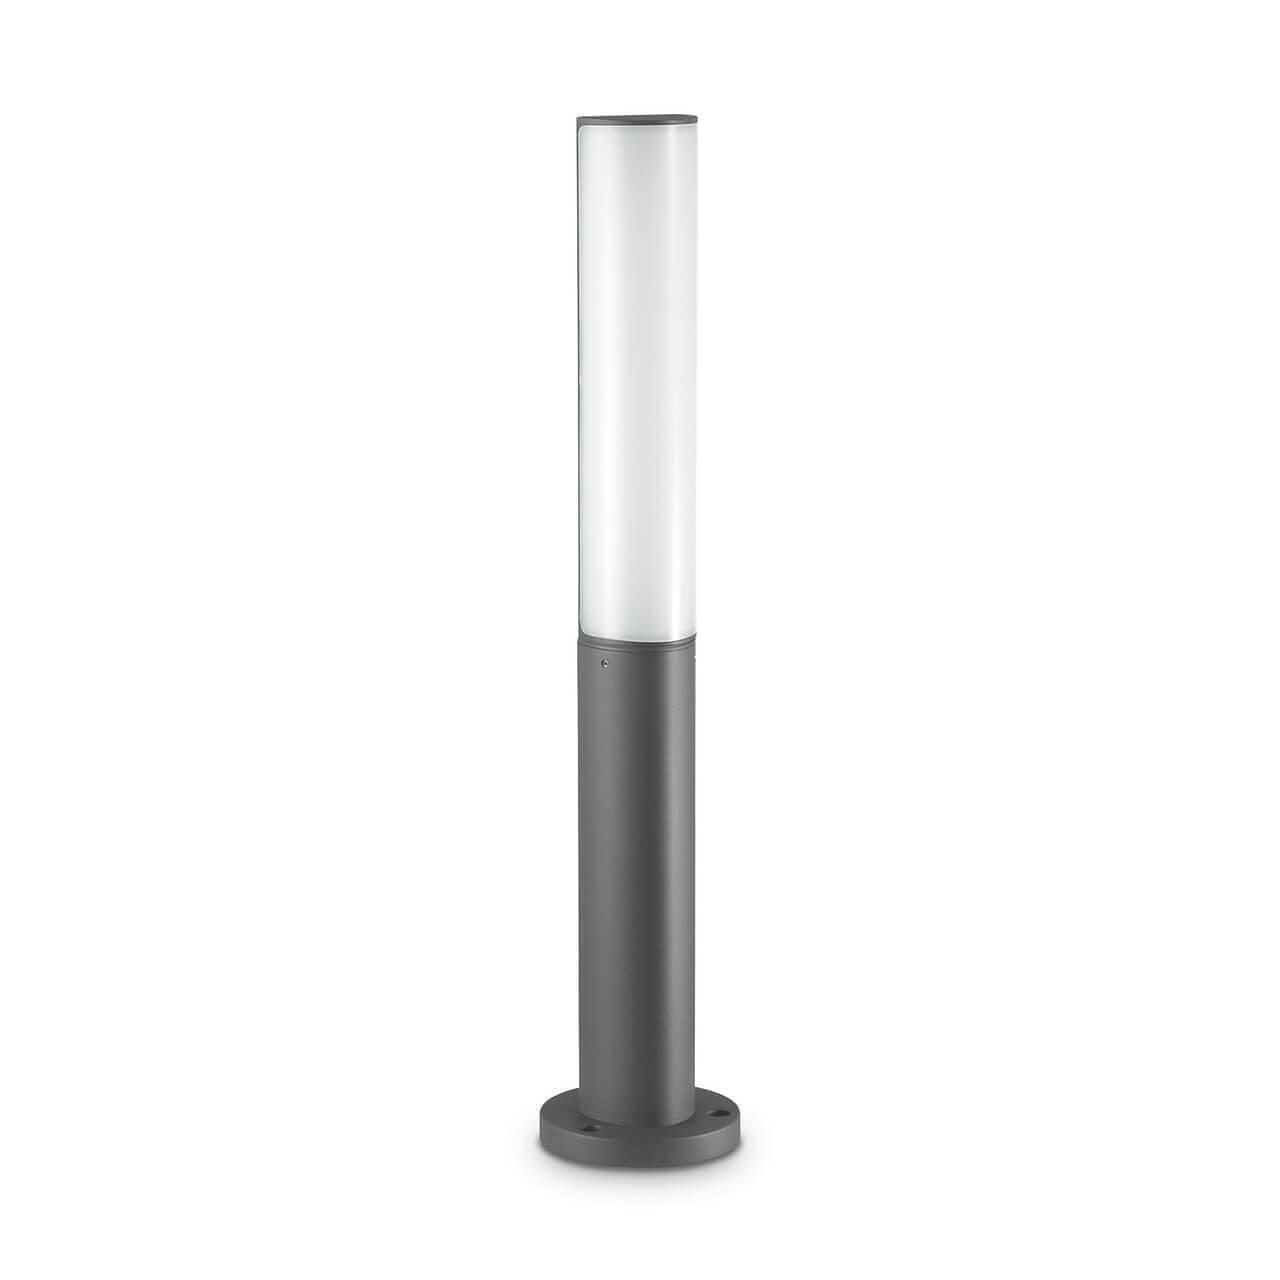 Светильник Ideal Lux Etere PT Antracite 4000K